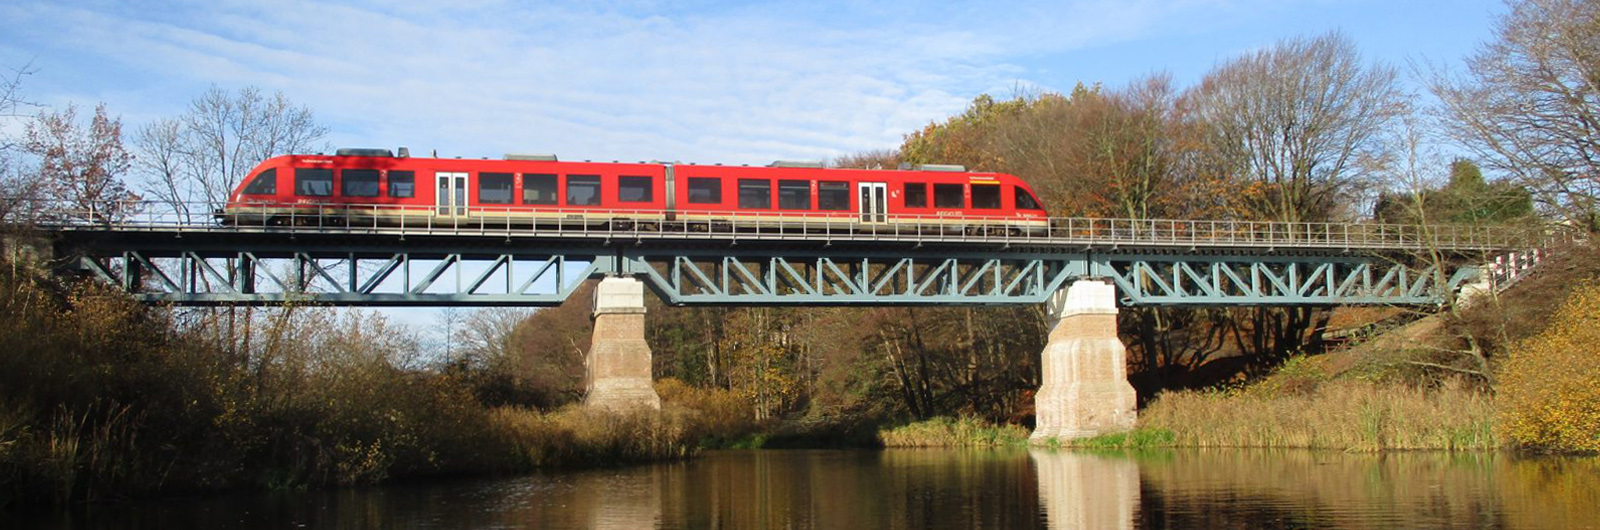 Schwentinebrücke Eisenbahnbrücke